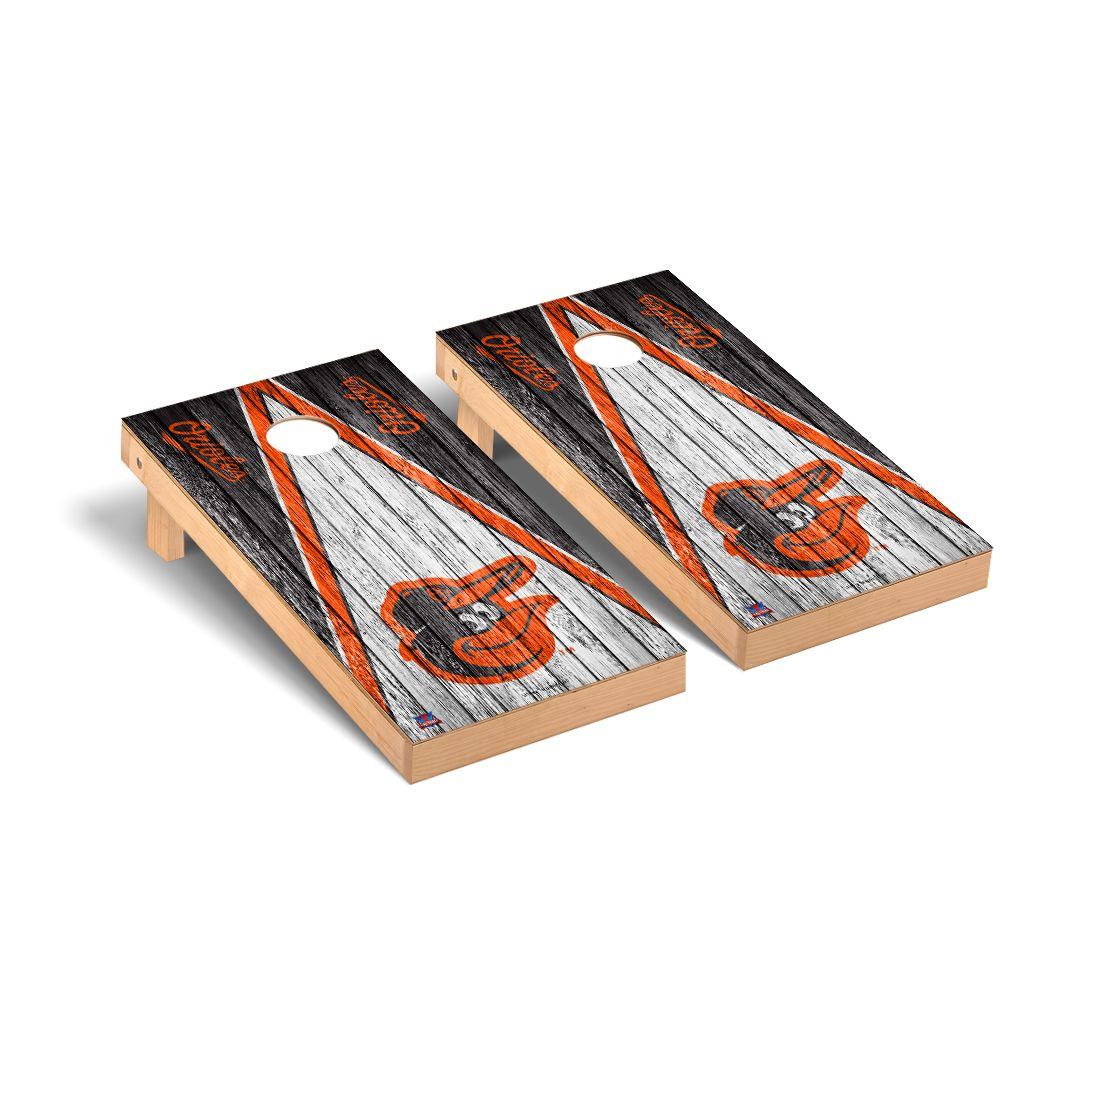 Baltimore Orioles MLB Baseball Cornhole Game Set Triangle Weathered Version